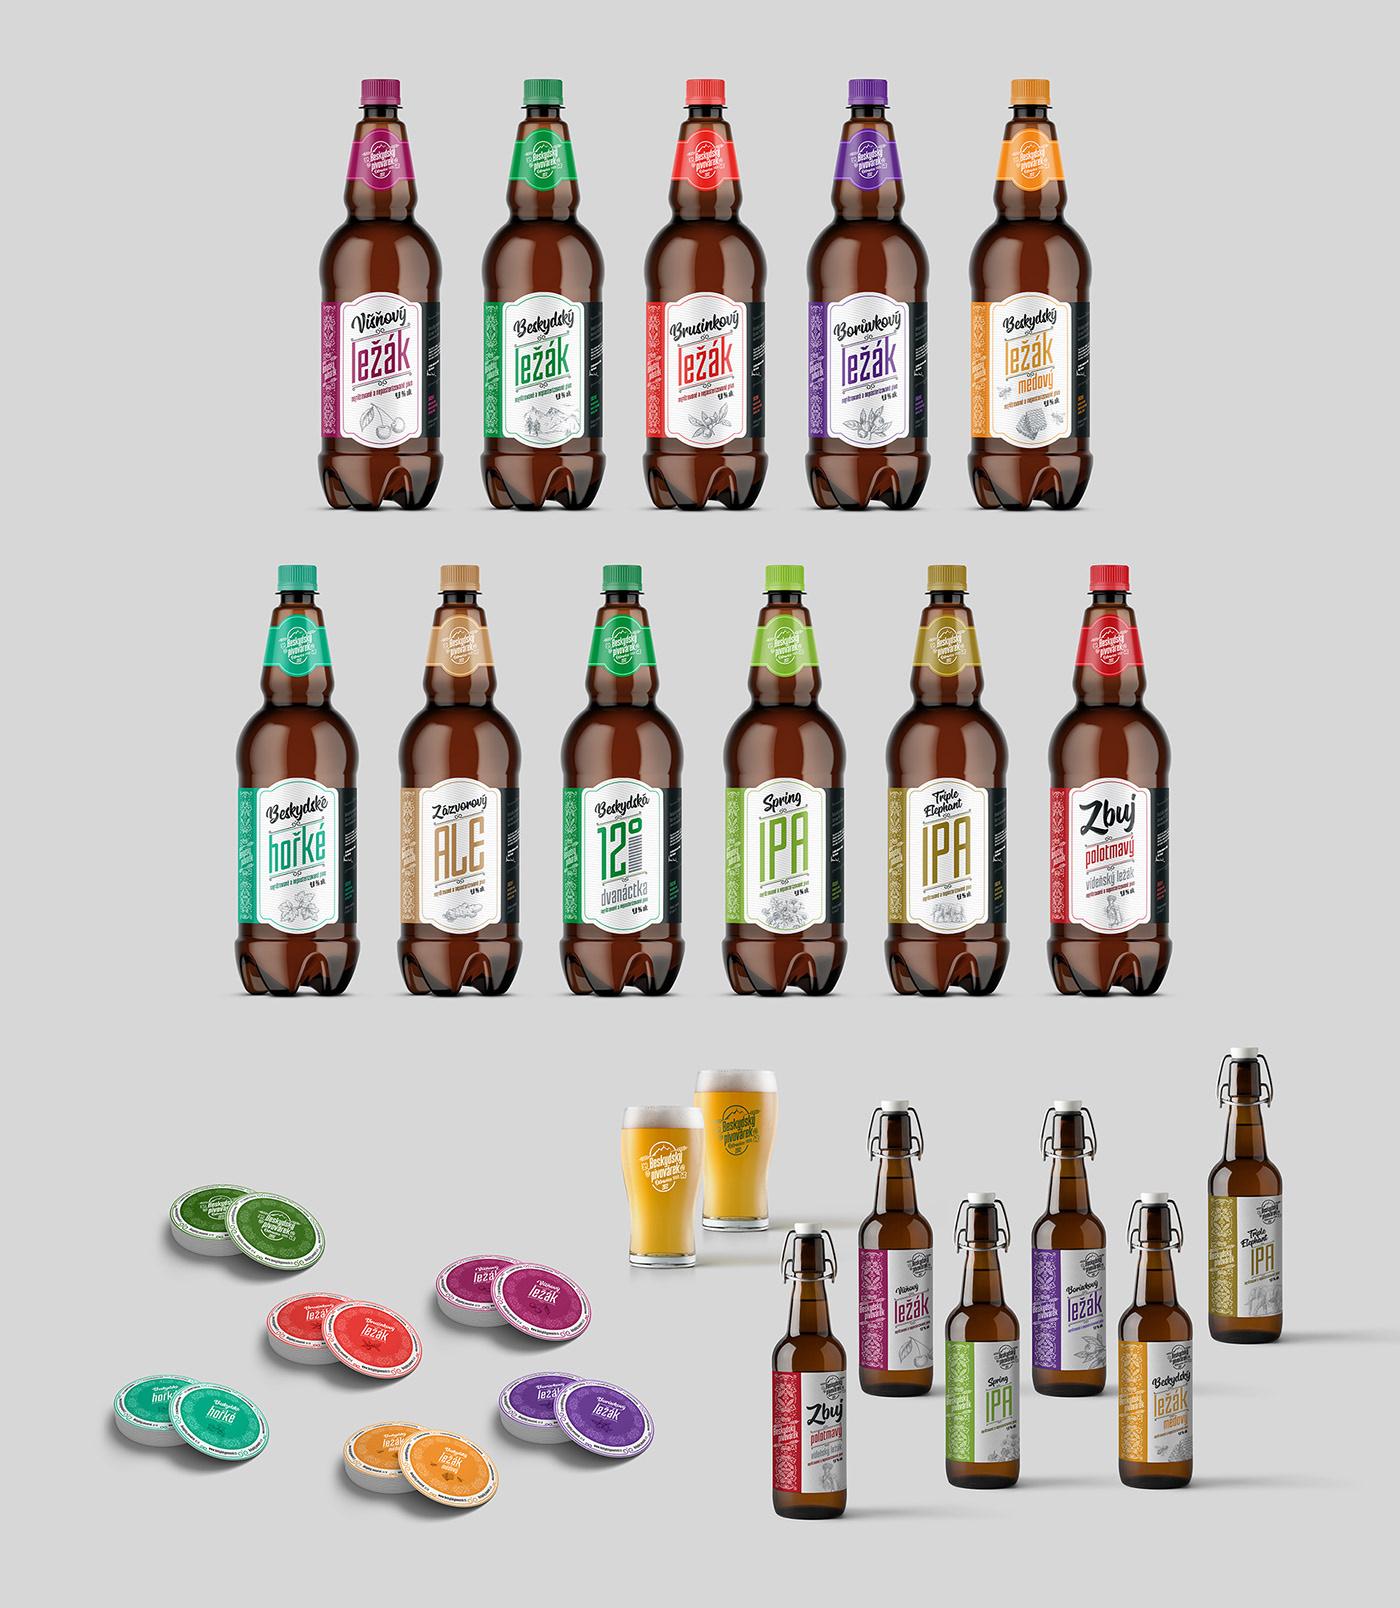 beer brewery hop bottle beskids etiquette Label brewing